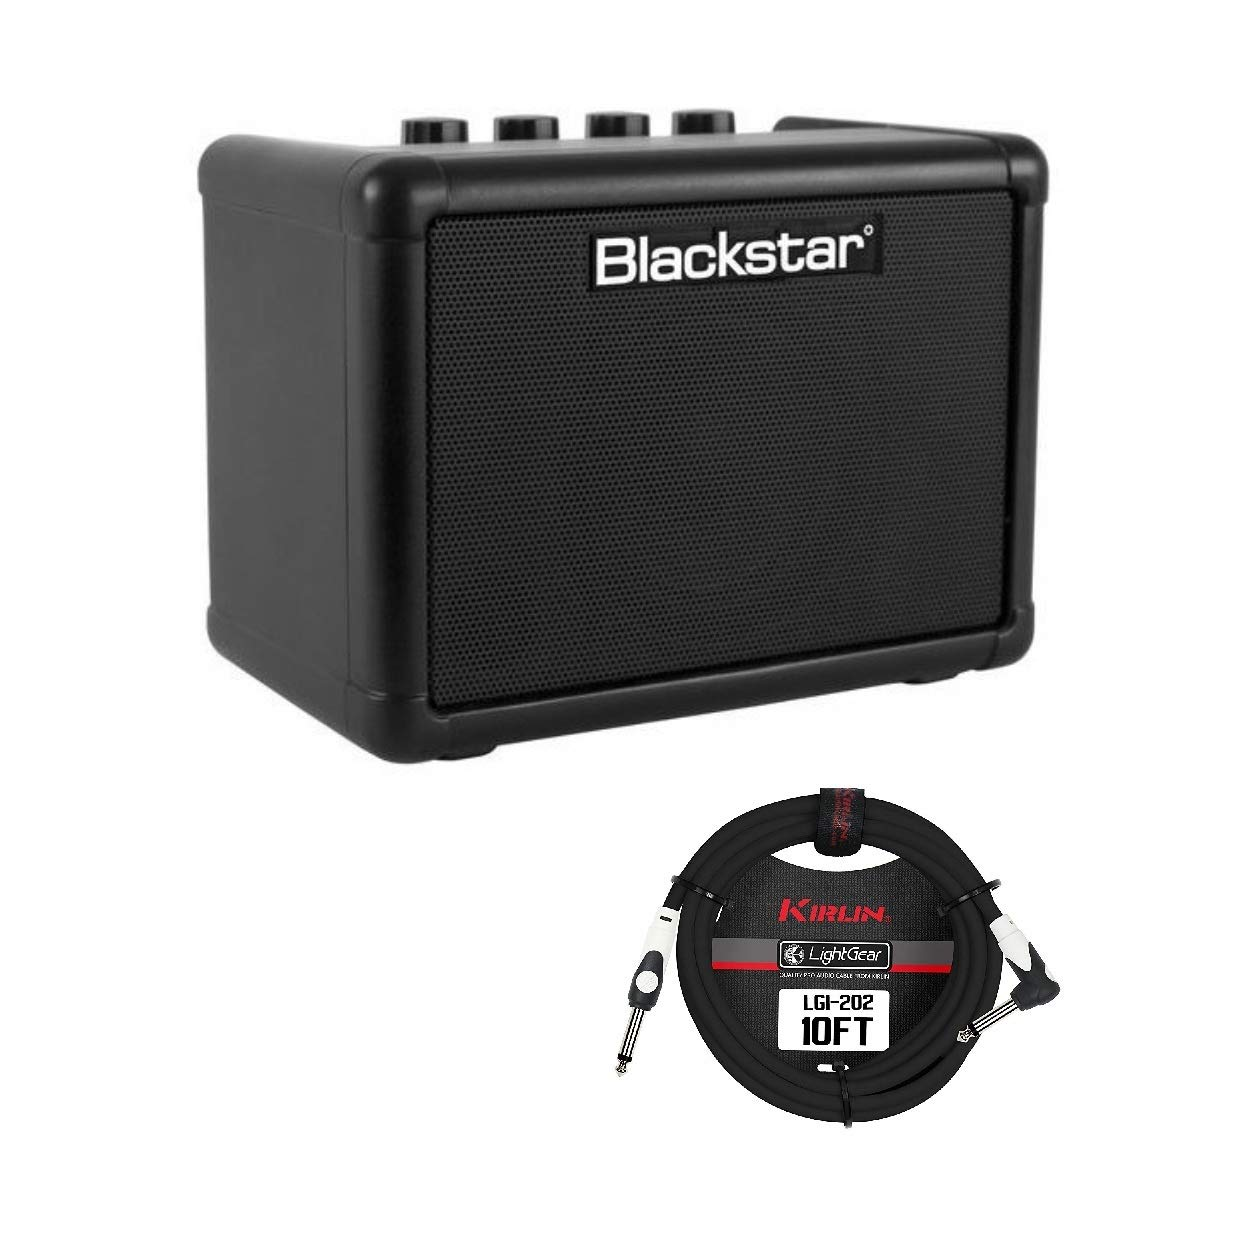 Blackstar FLY3 3 Watt Battery Powered Guitar Amp with Cable by Blackstar